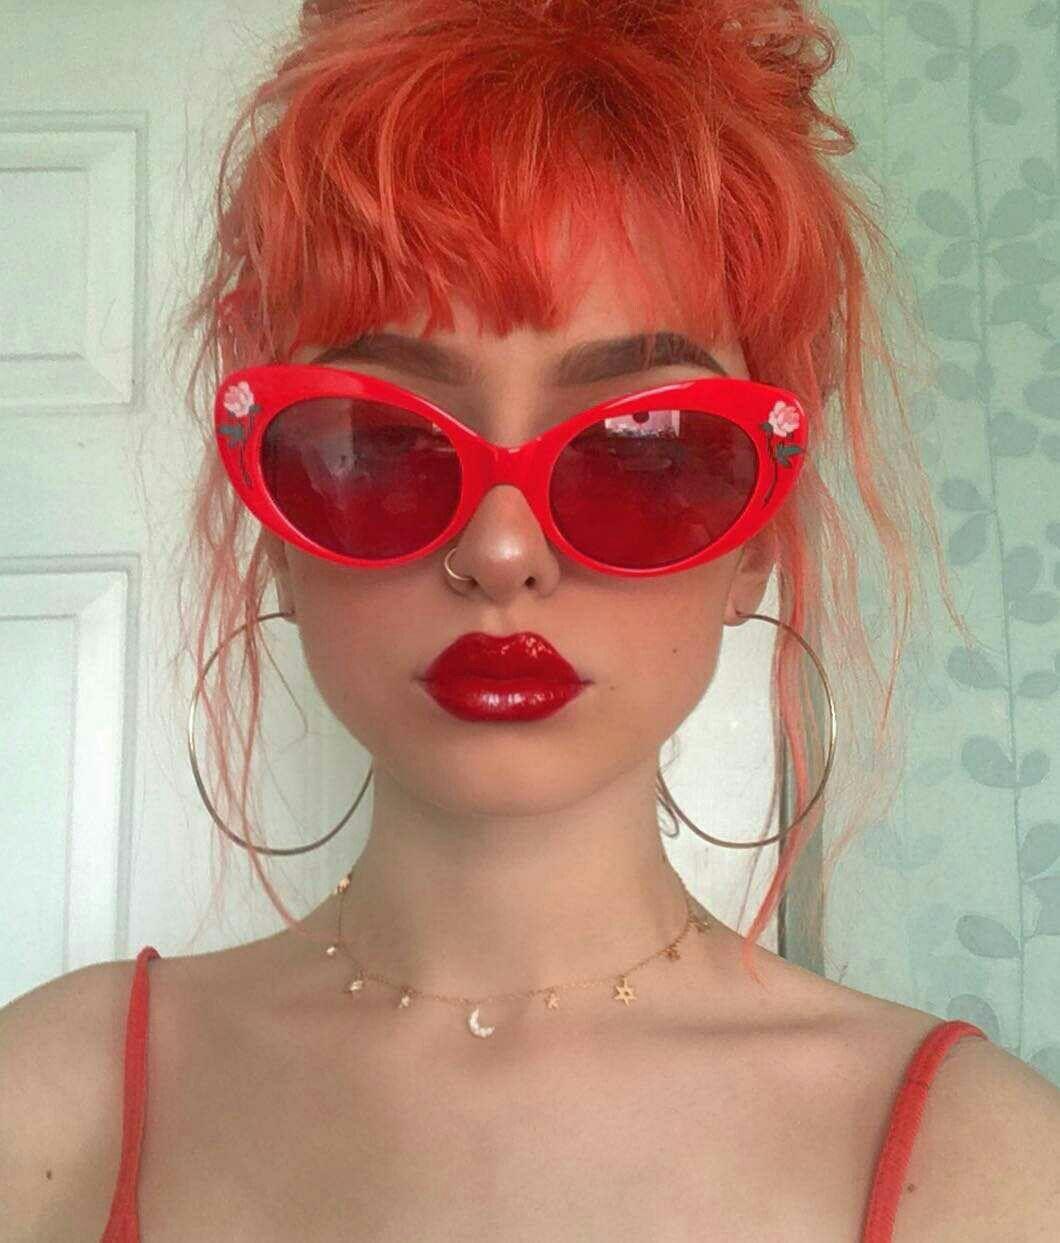 ̗̀∙ Pinterest giudf1 ∙ ̖́ Red aesthetic, Beauty